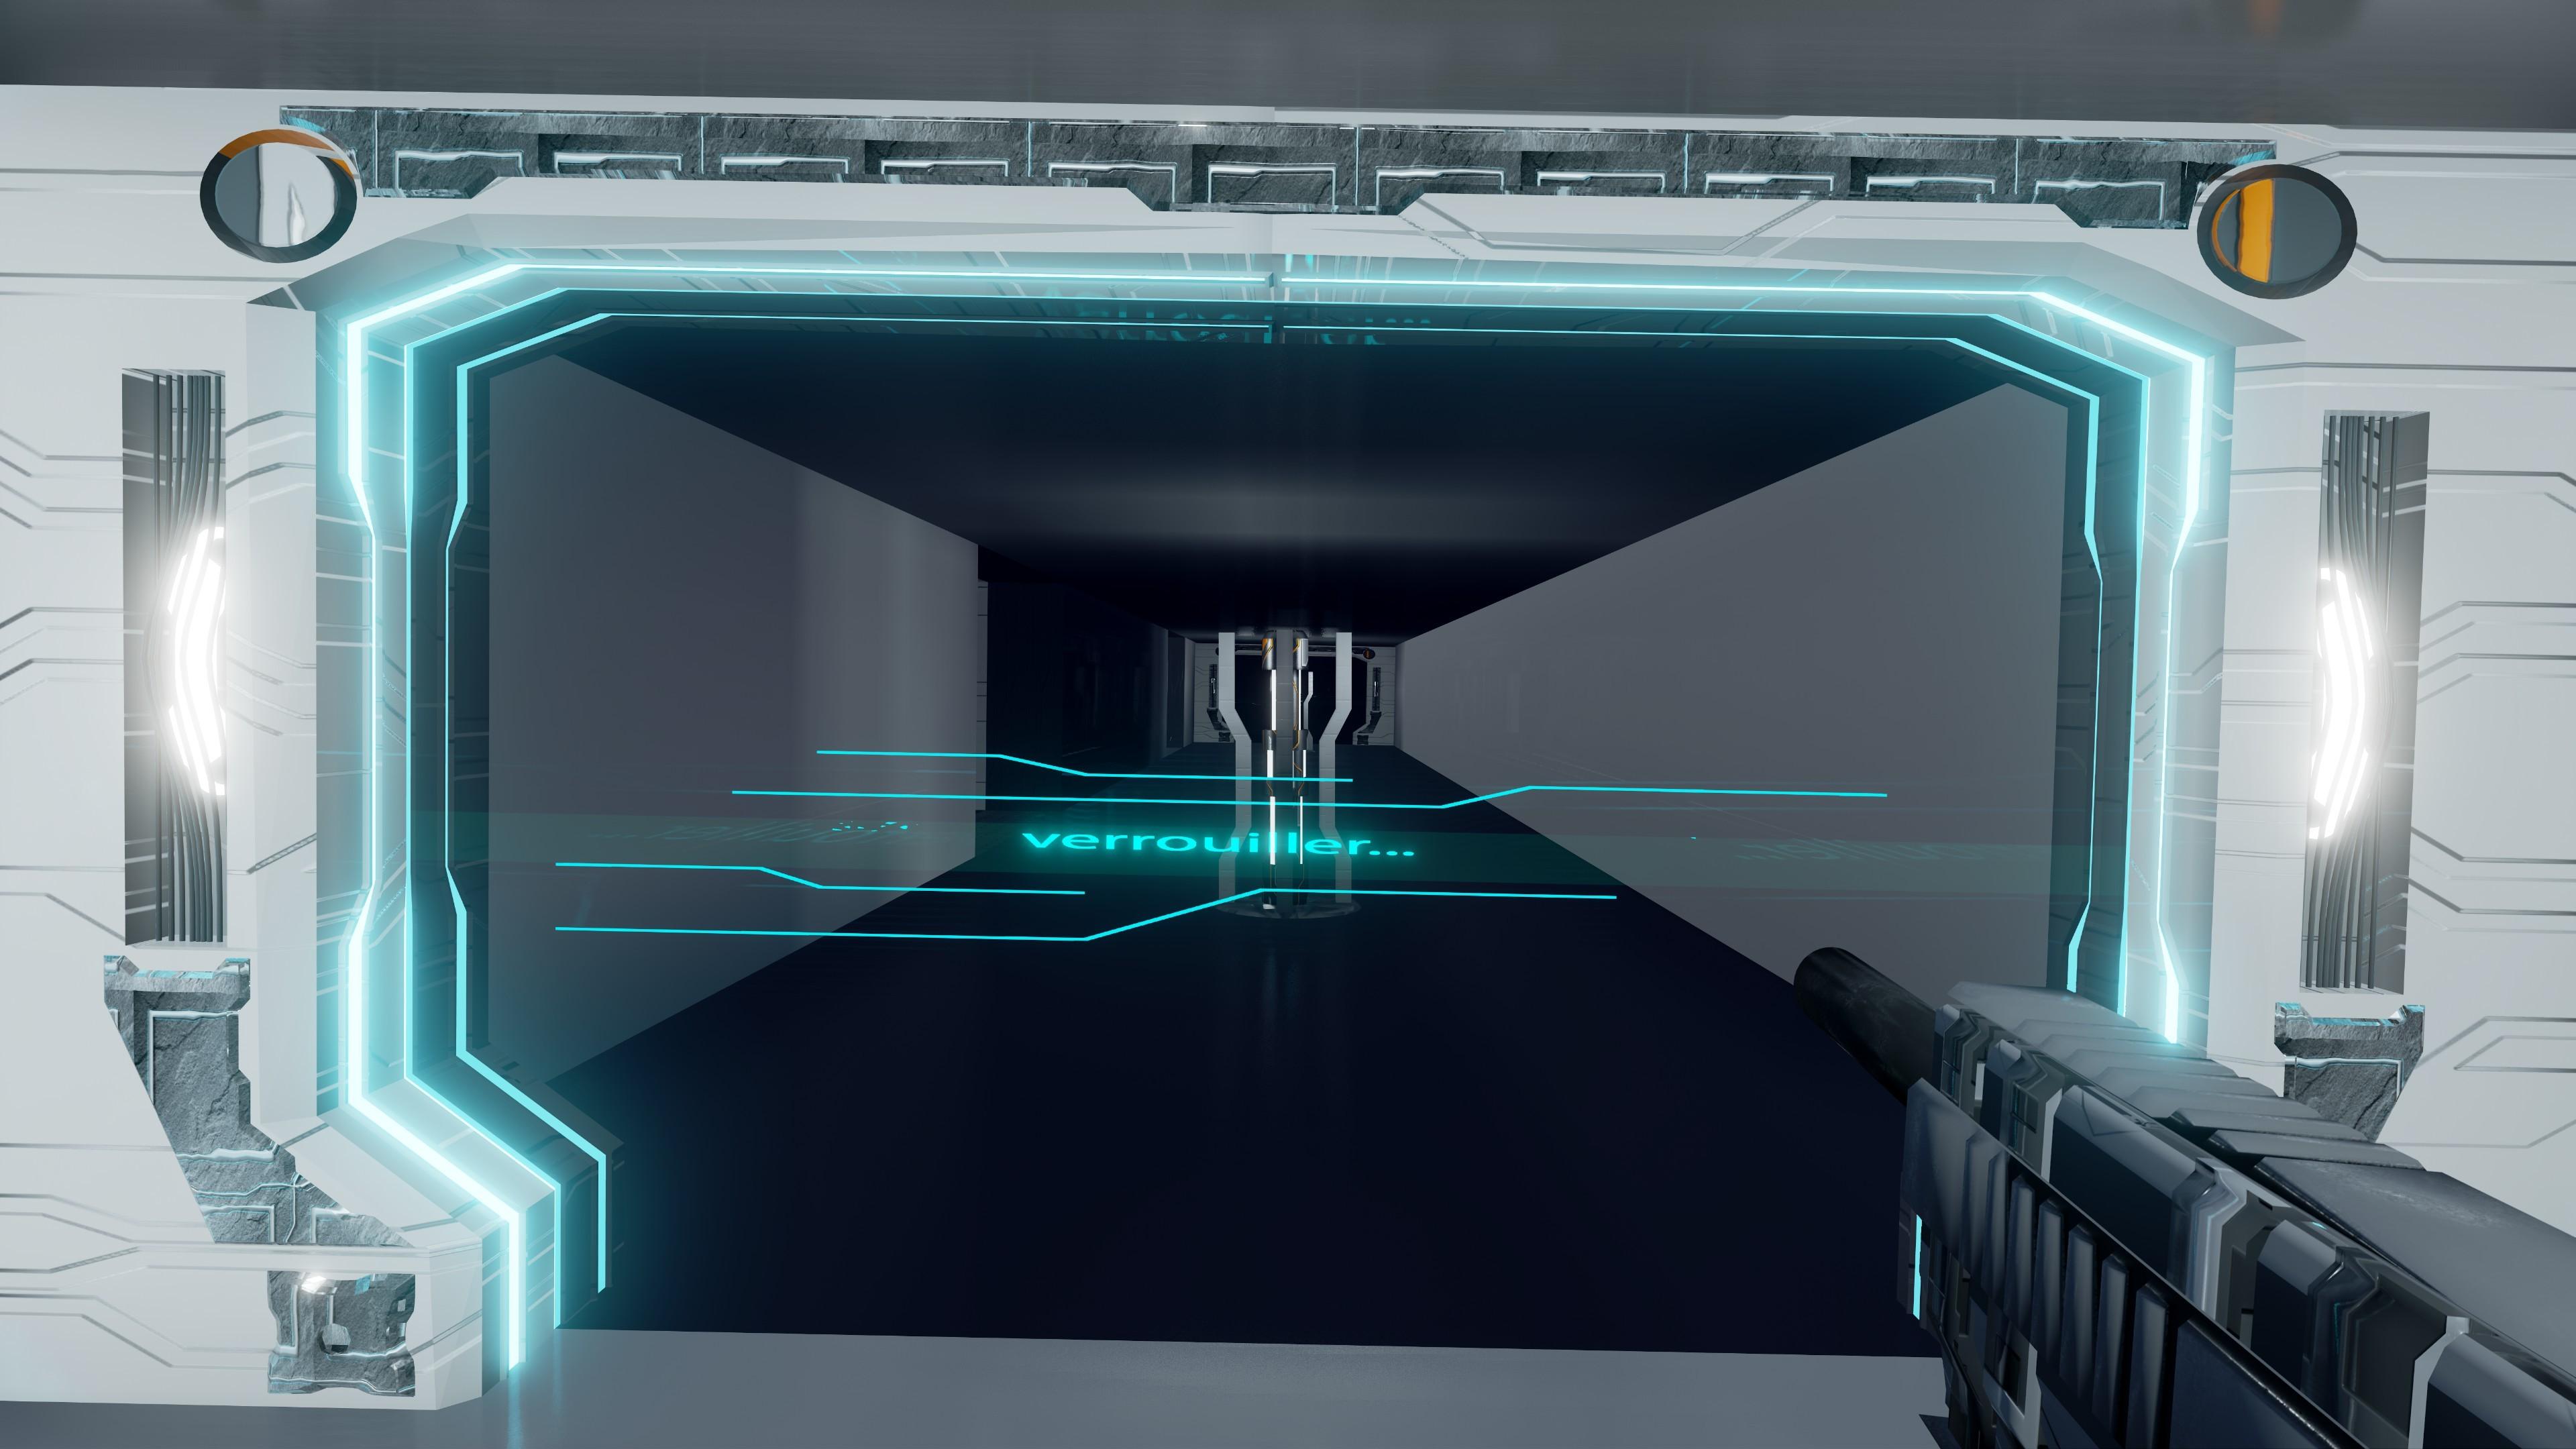 EXOTIUM - Episode 10 screenshot